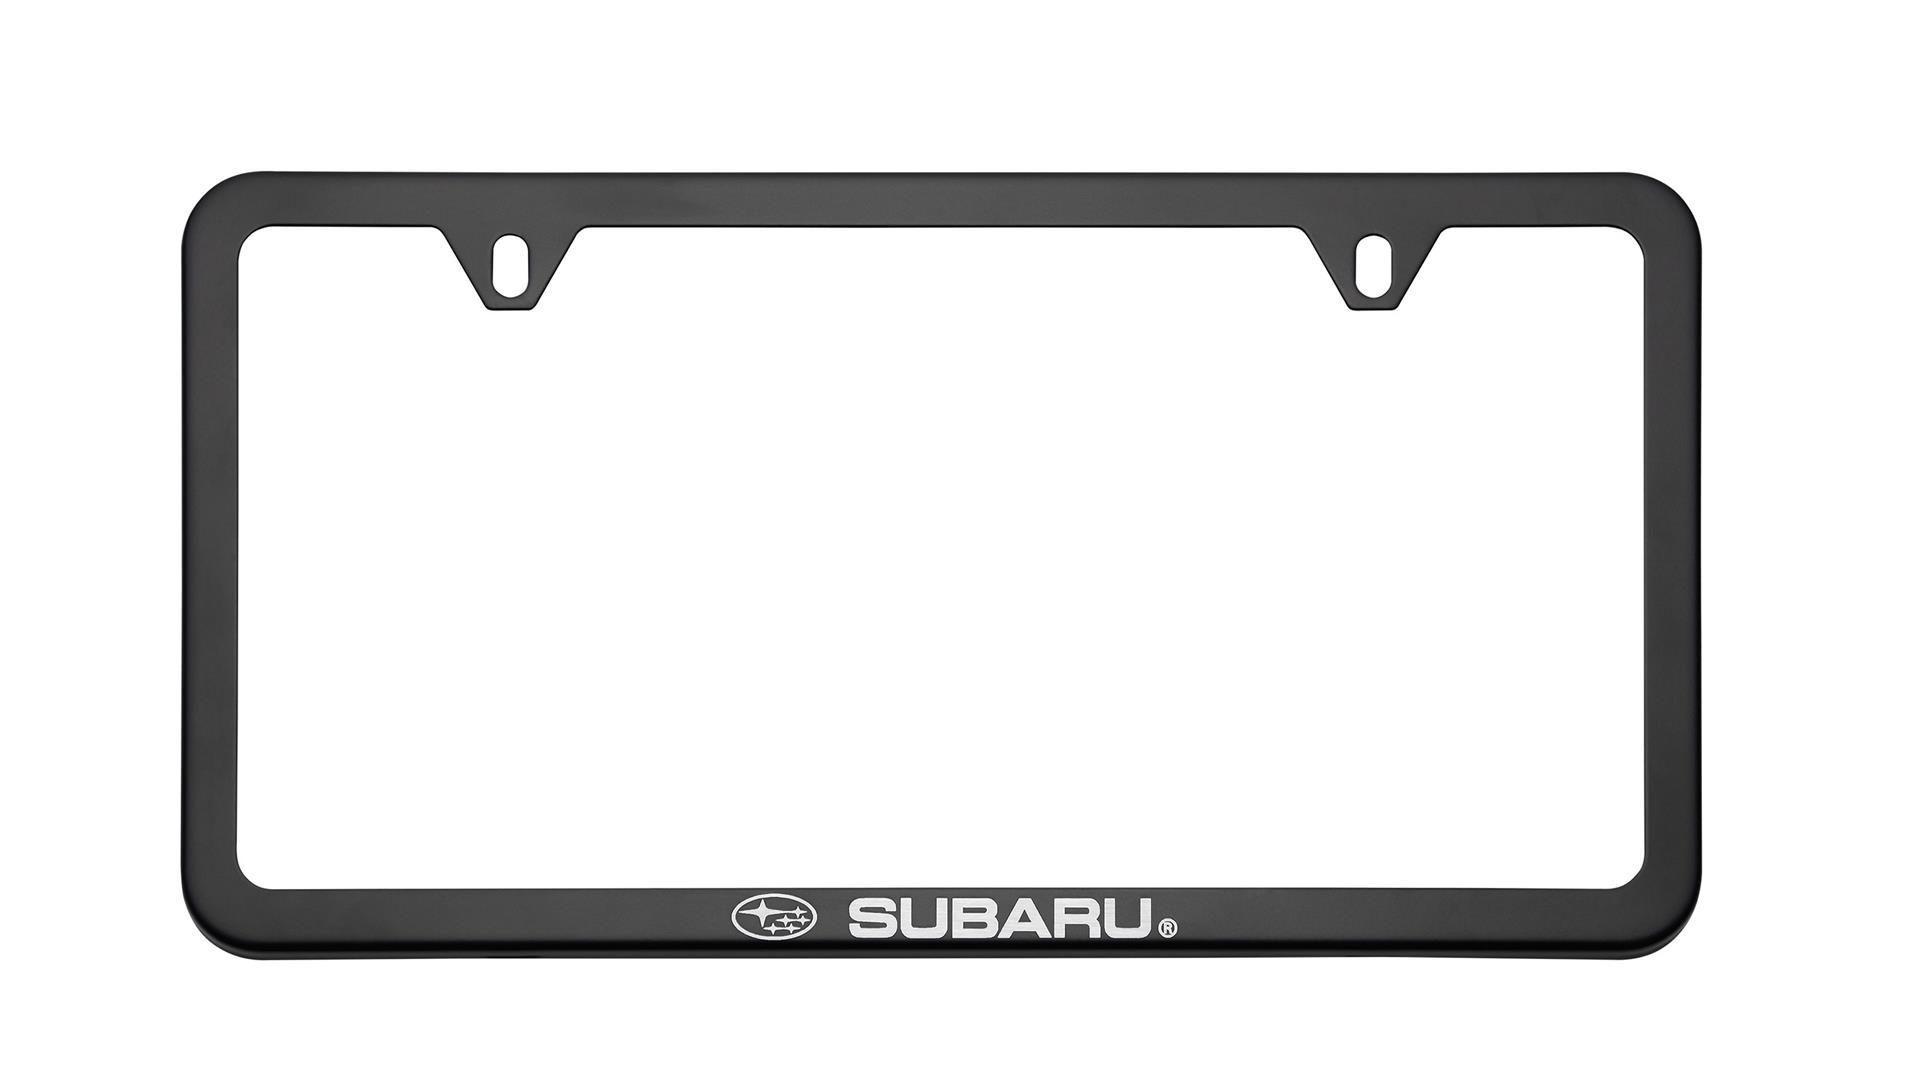 Subaru Impreza Subaru License Plate Frame